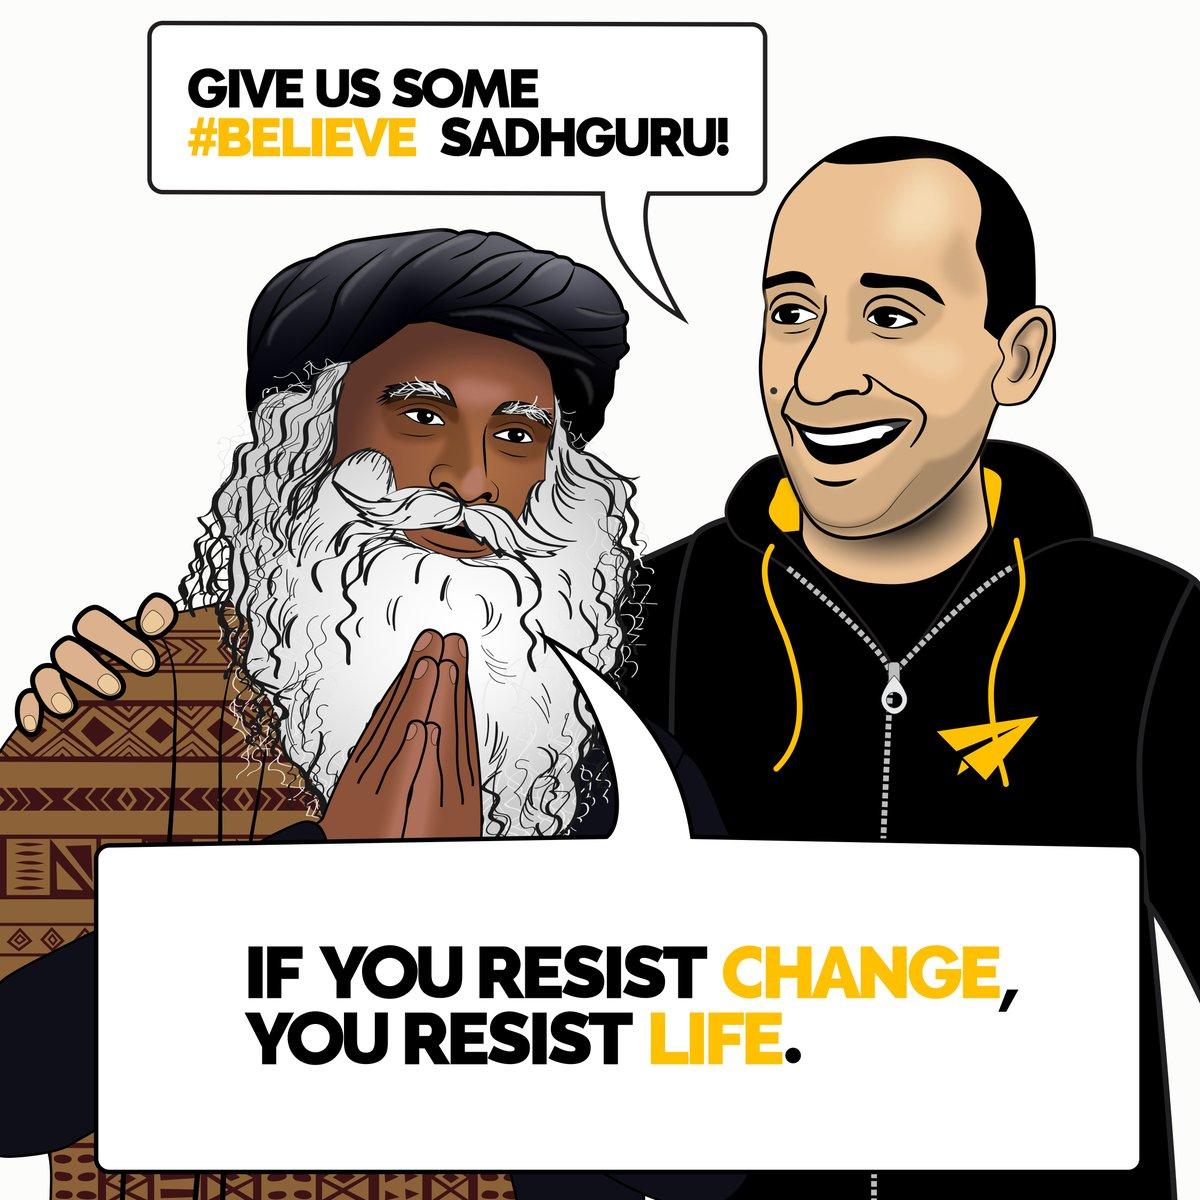 If you resist change, you resist life. @SadhguruJV | Do you AGREE or DISAGREE? #Believe . #energy #spiritual #consciousness